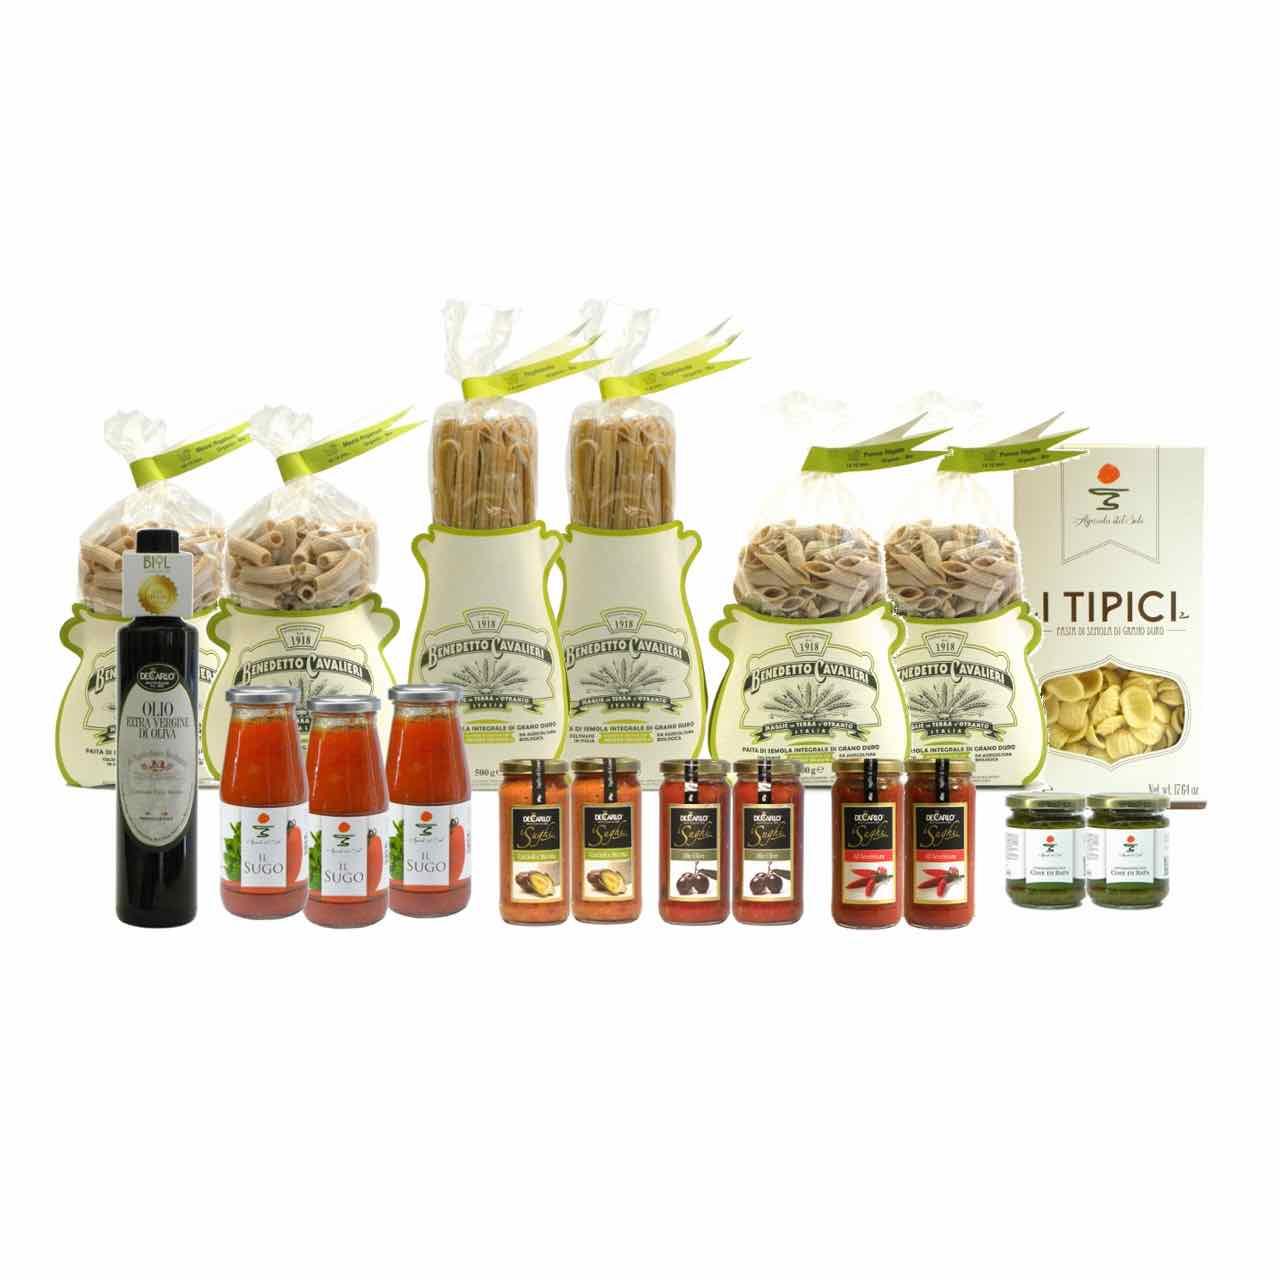 Confezione dispensa pasta integrale – Pantry italian wholewheat pasta – Gustorotondo Italian food boutique – I migliori cibi online – Best Italian foods online – spesa online